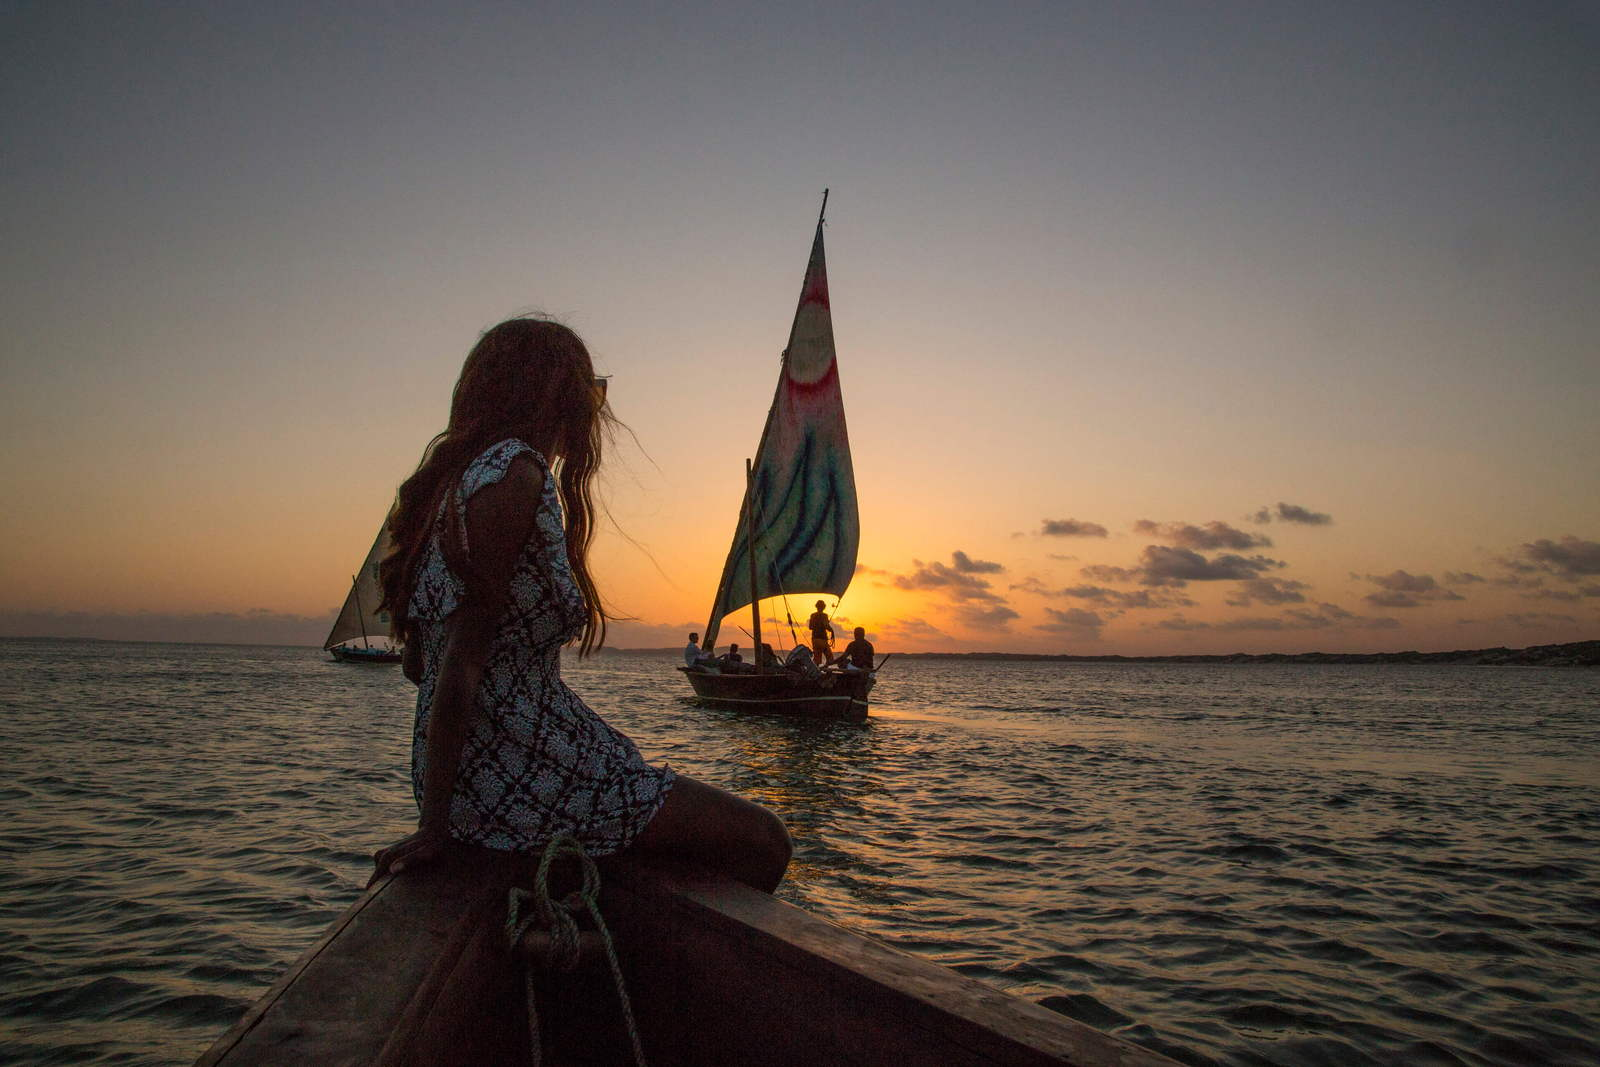 Woman Sailing On A Boat During Sunset on Lamu Island